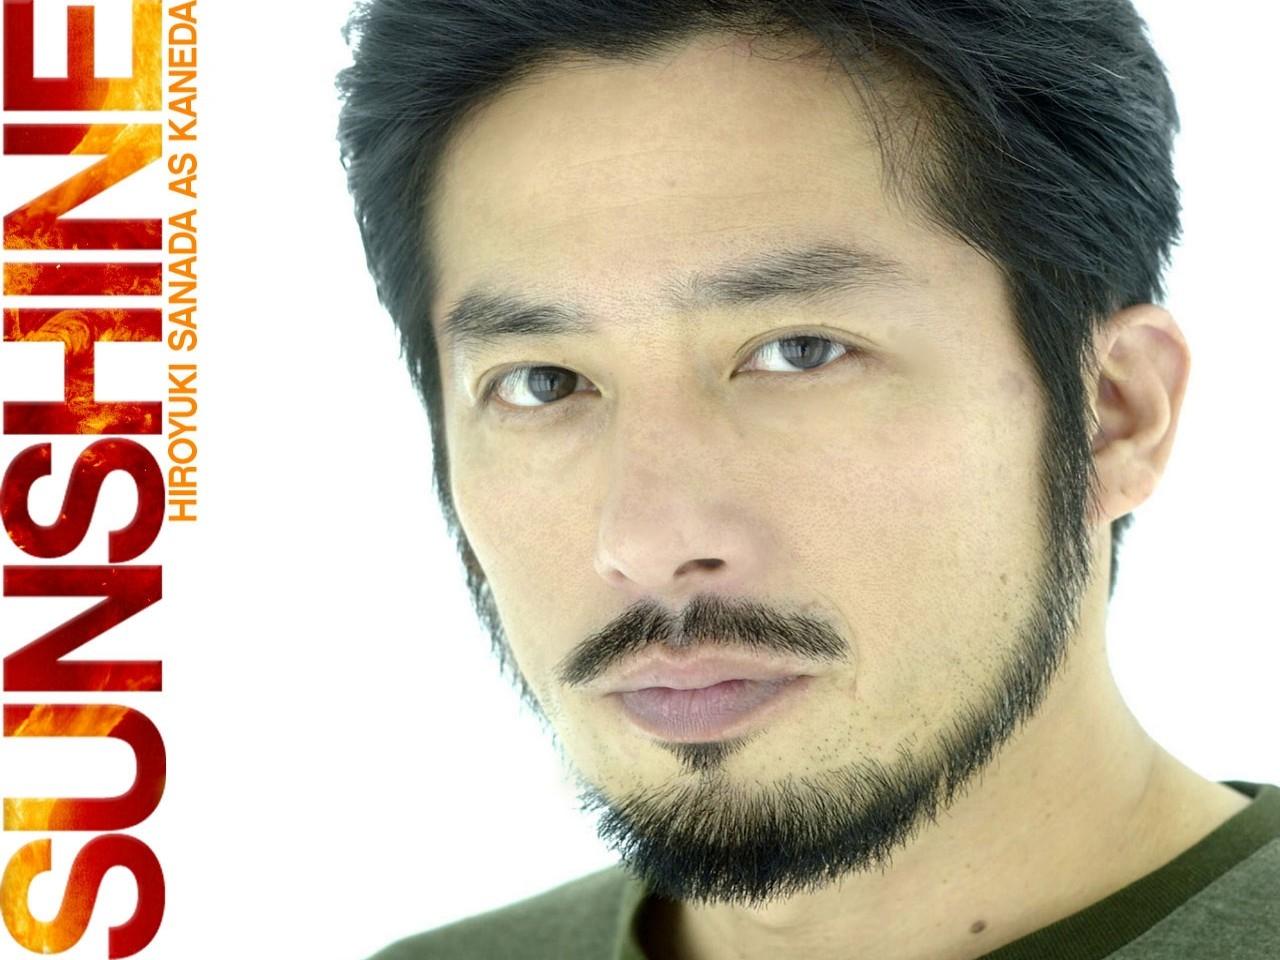 Wallpaper del film Sunshine con Hiroyuki Sanada